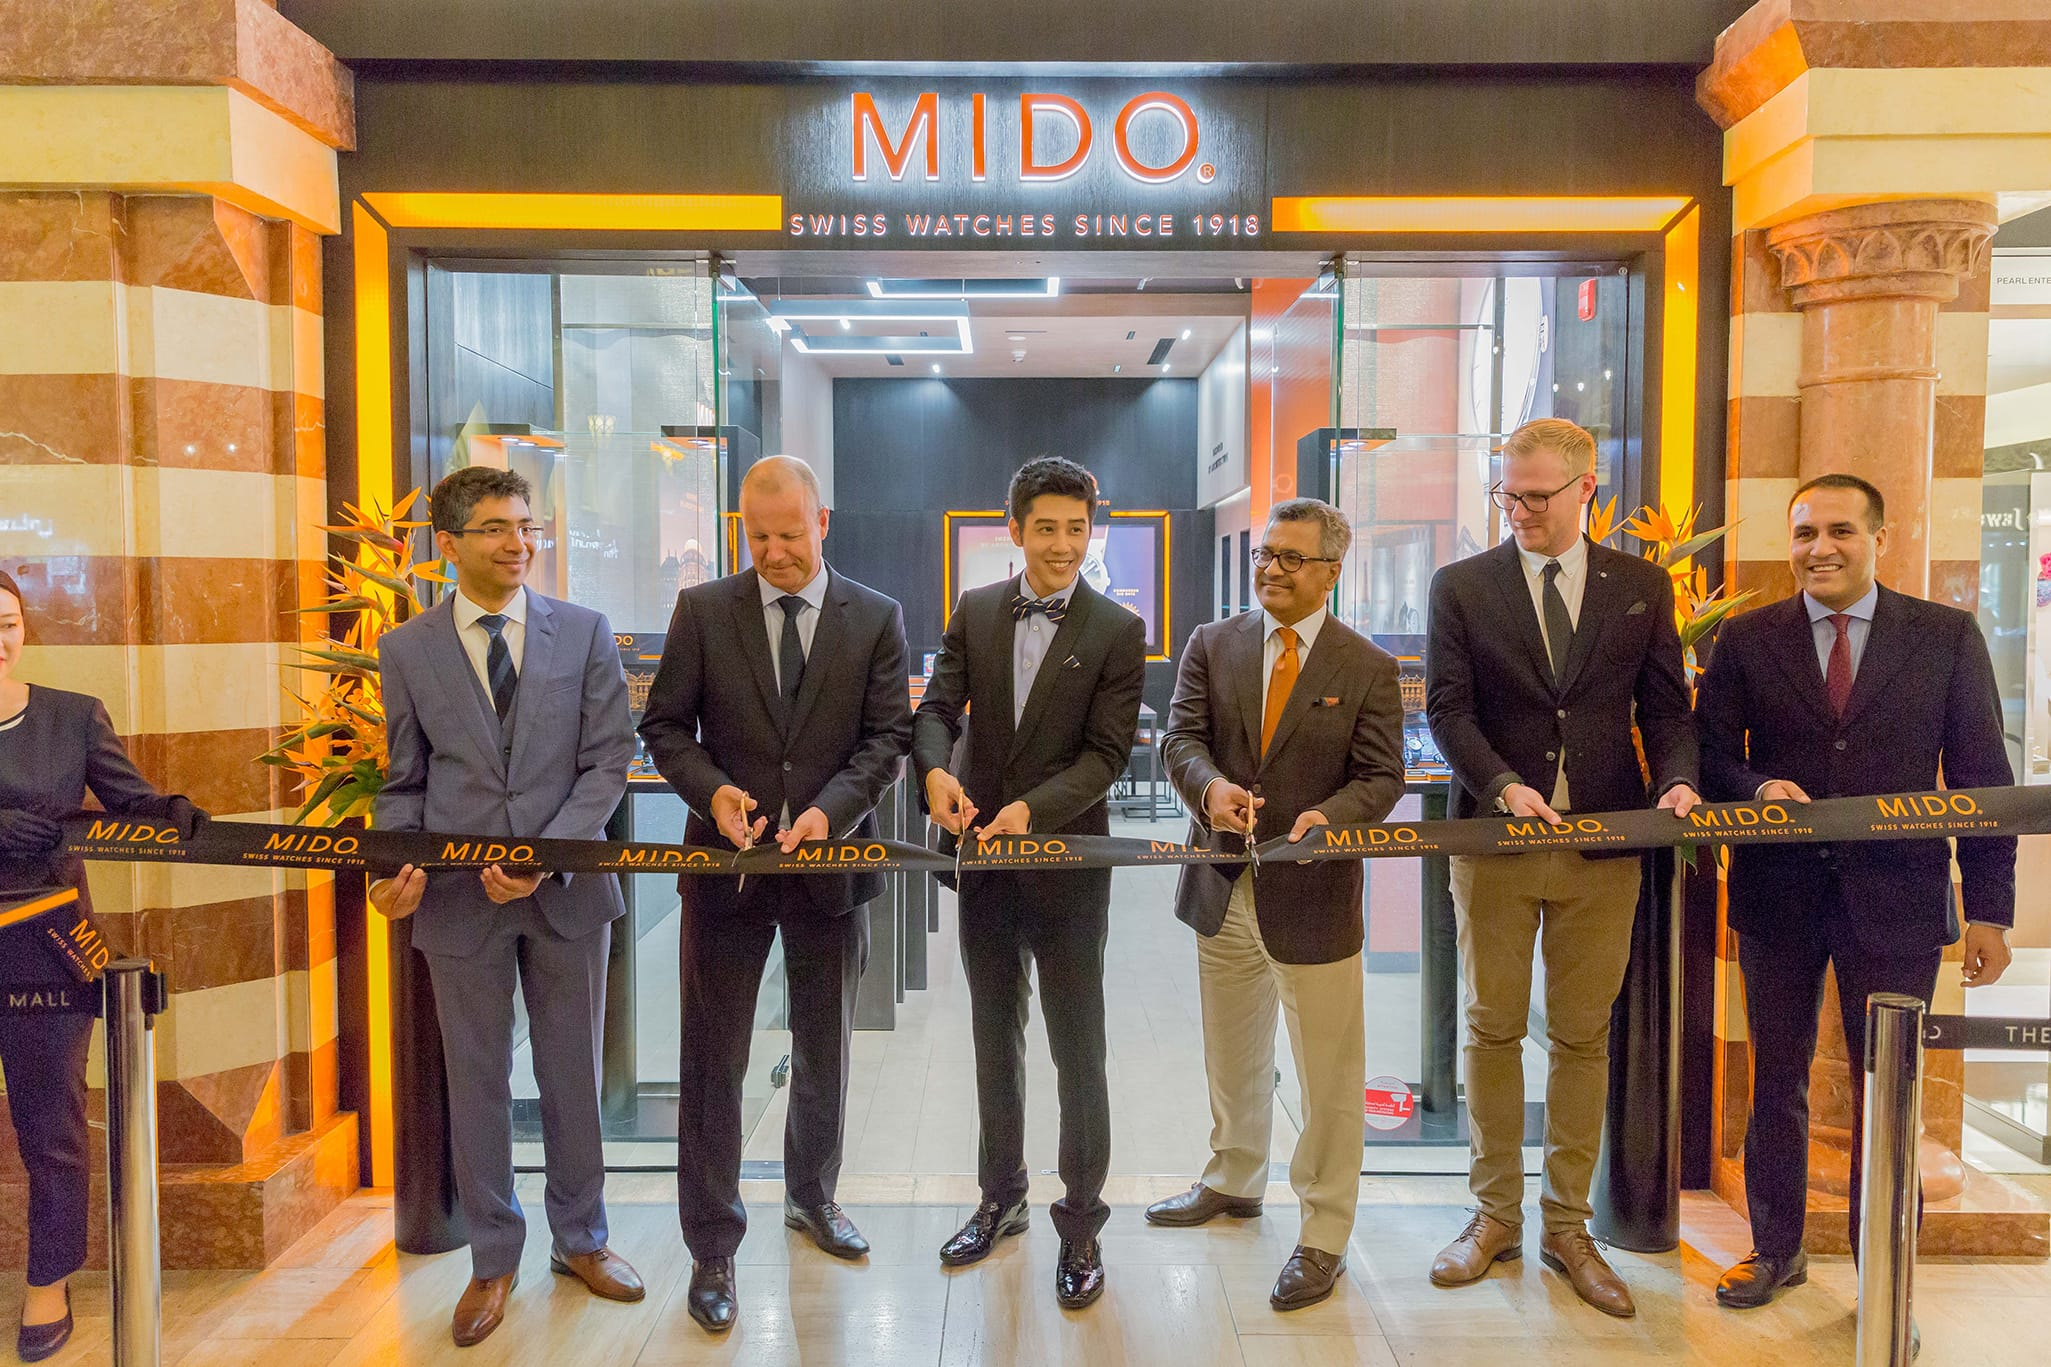 Mido opens a new boutique at the Dubai Mall